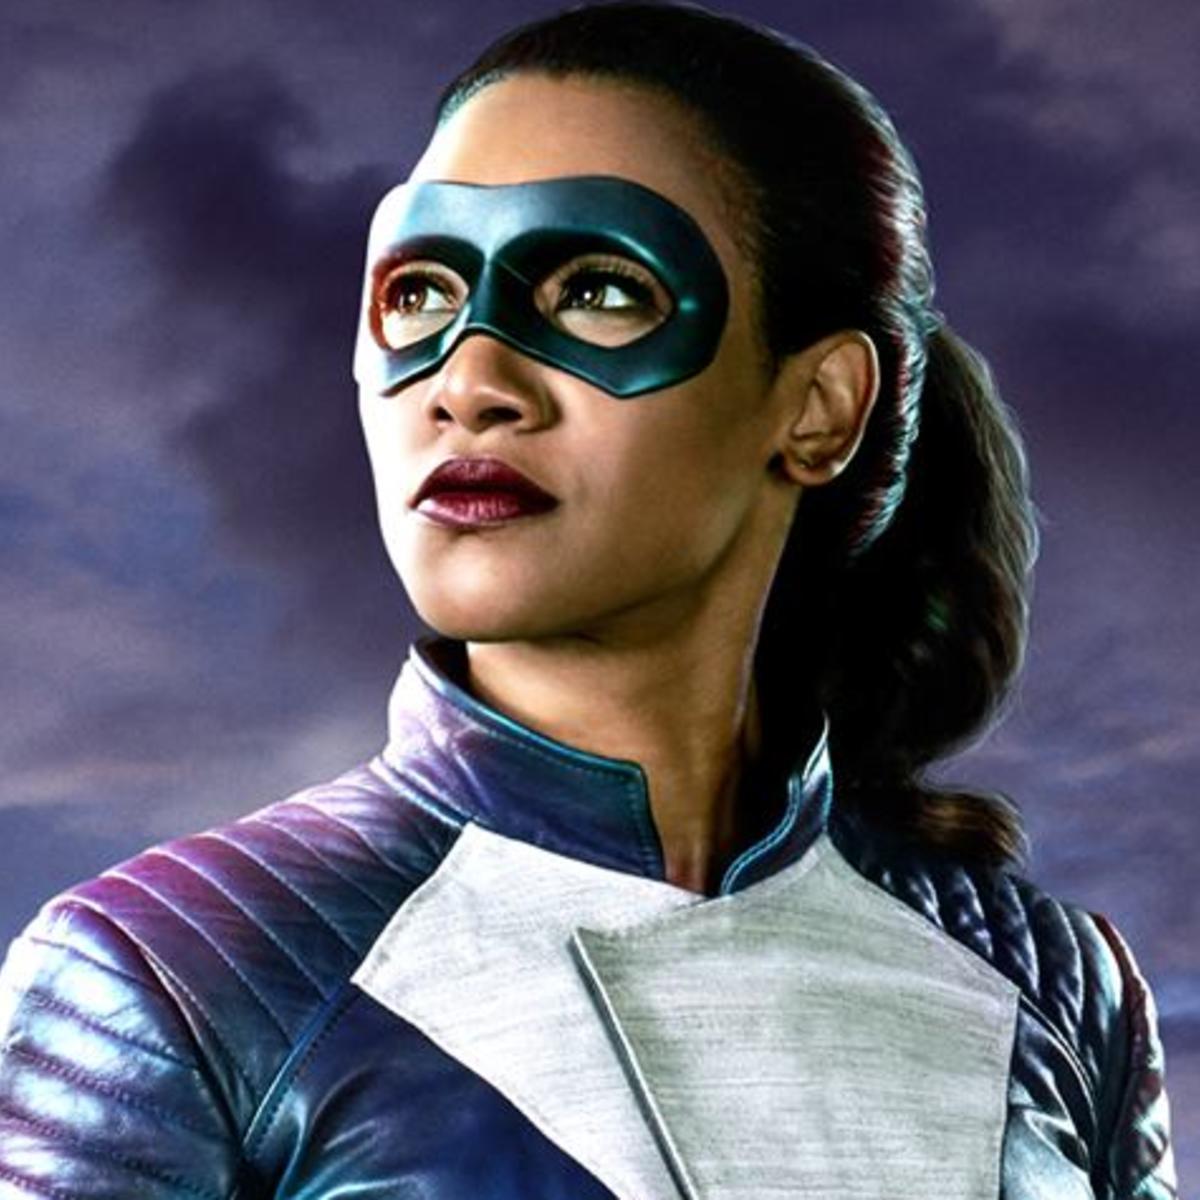 candice-patton-the-flash-suit.png